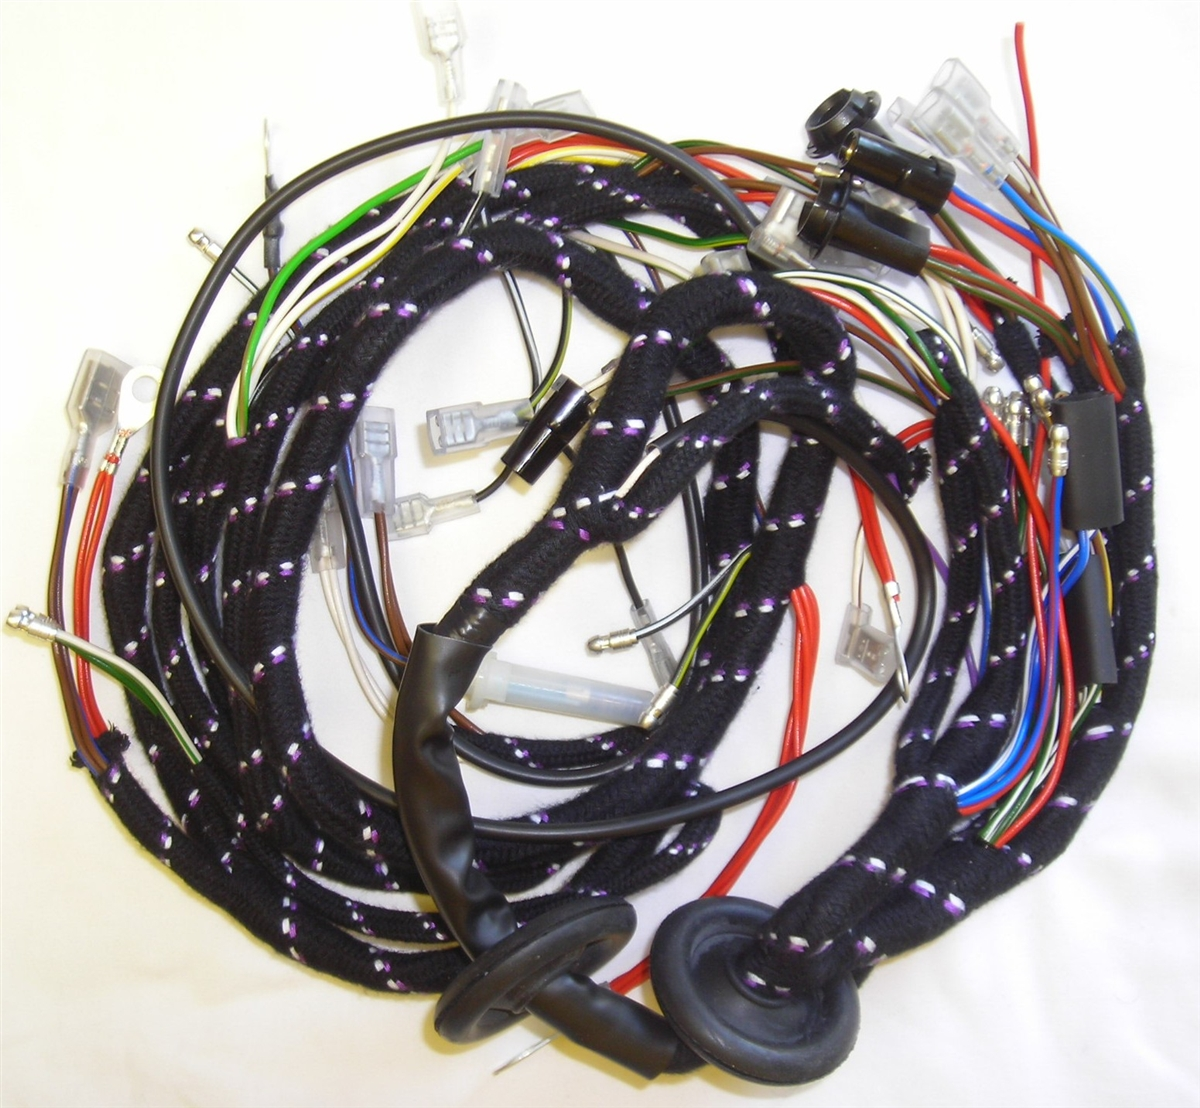 hight resolution of triumph t140 wiring diagram wiring library 1976 1978 triumph t140v tr7rv main harness mc73pb